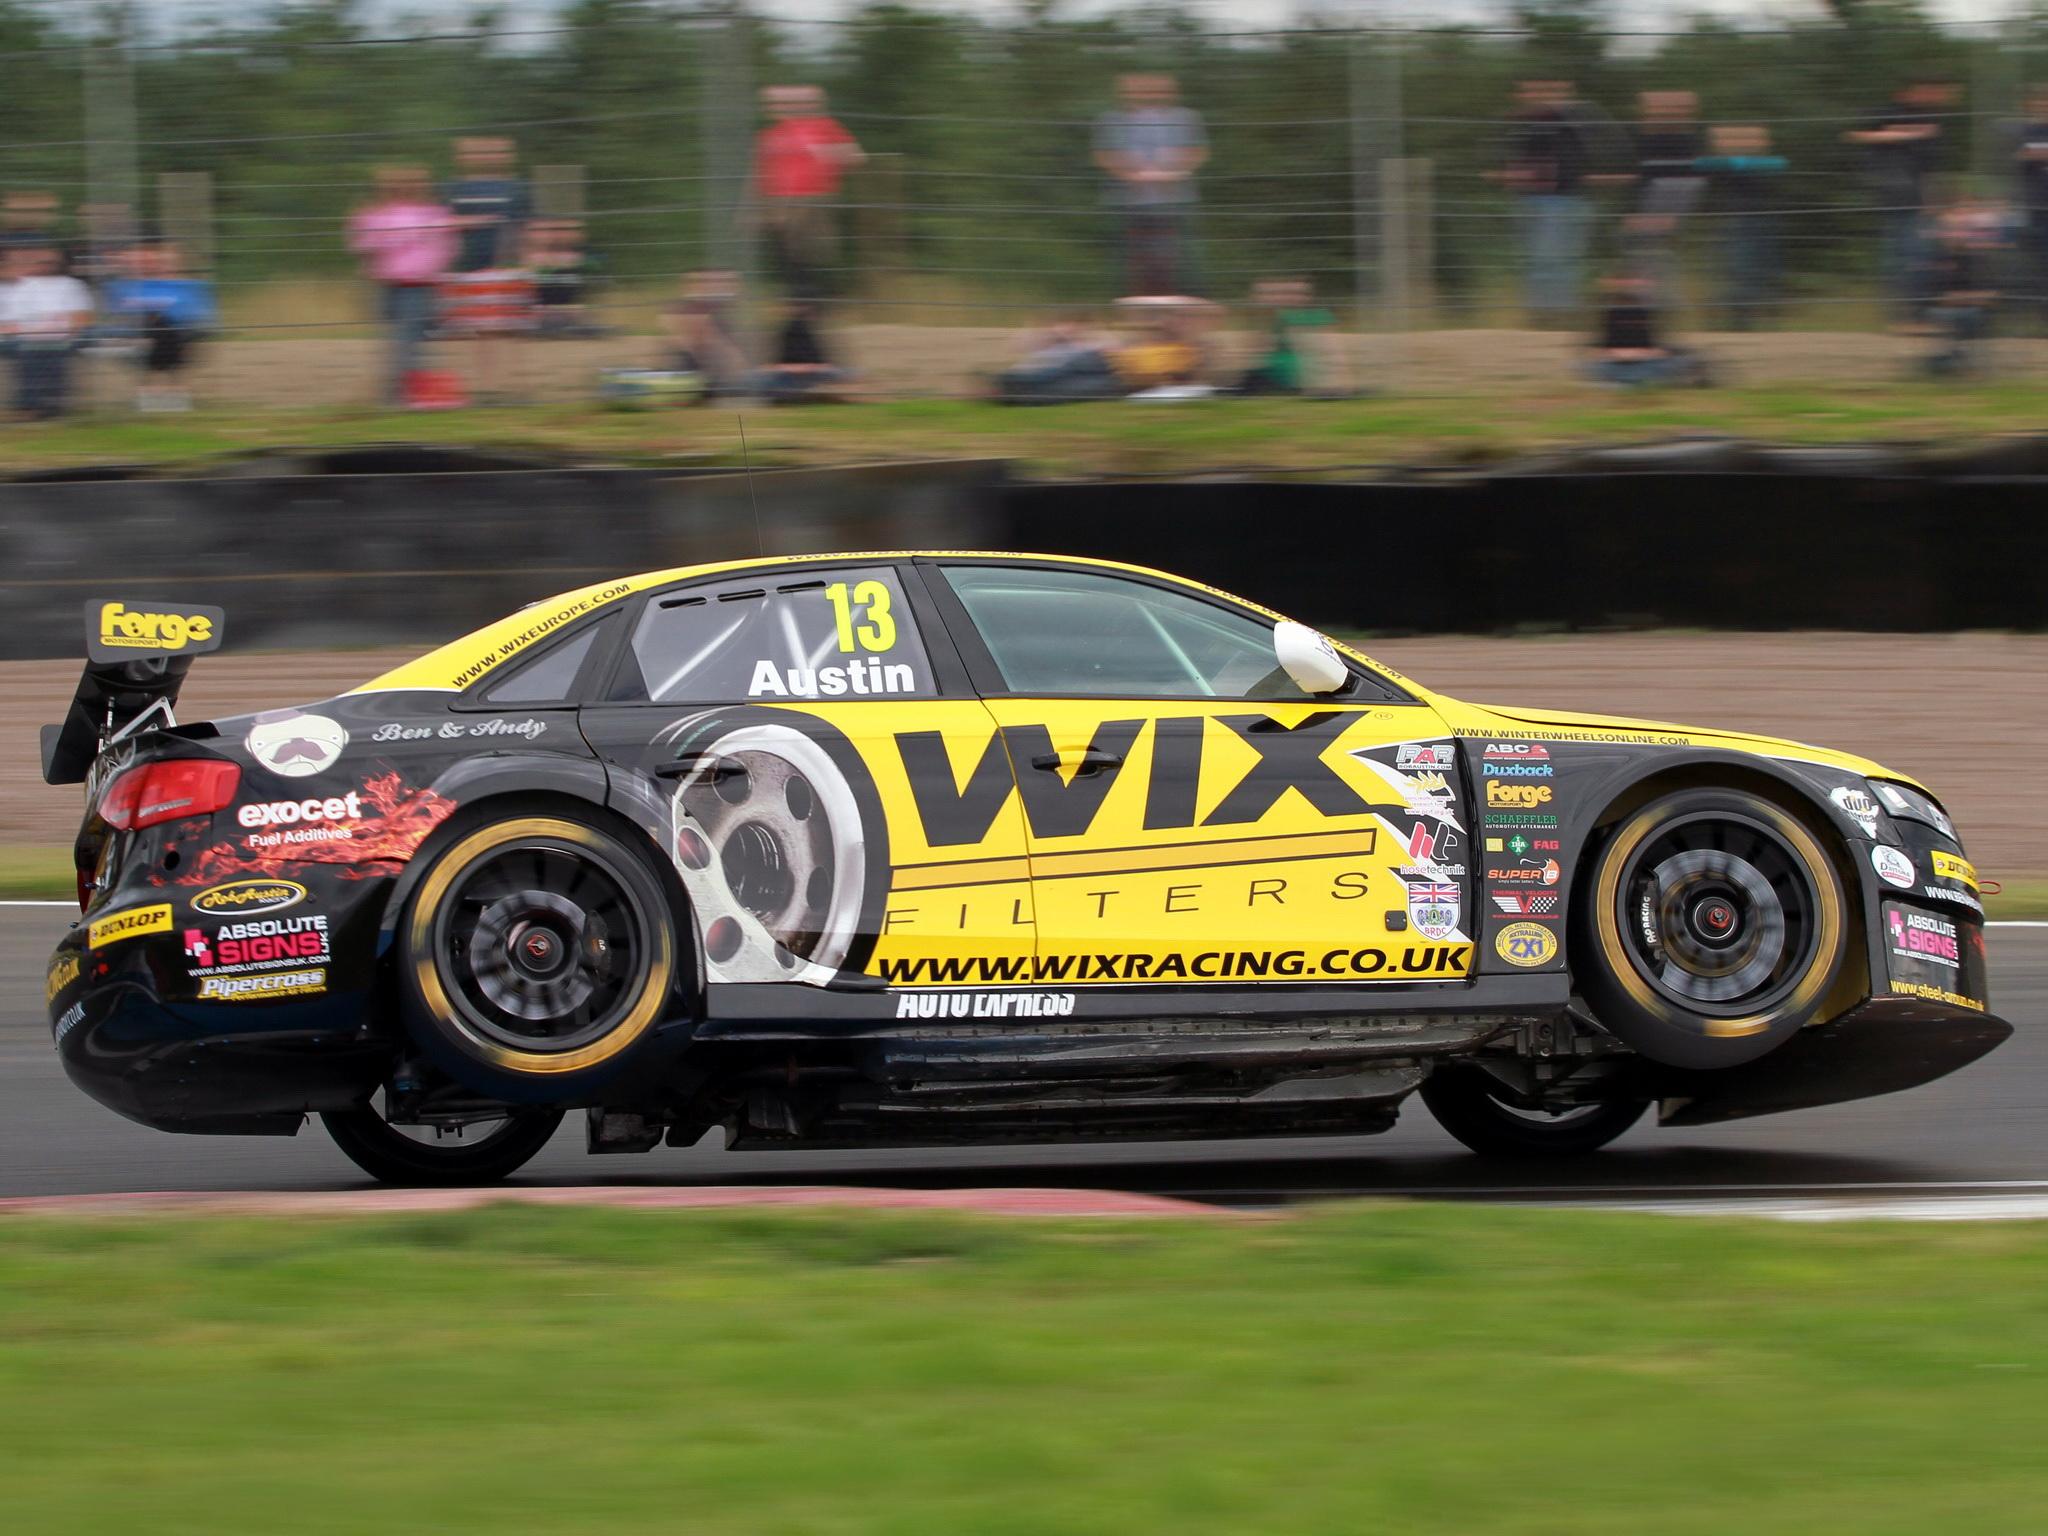 2011 Audi A4 BTCC race racing a 4 g wallpaper 2048x1536 187837 2048x1536